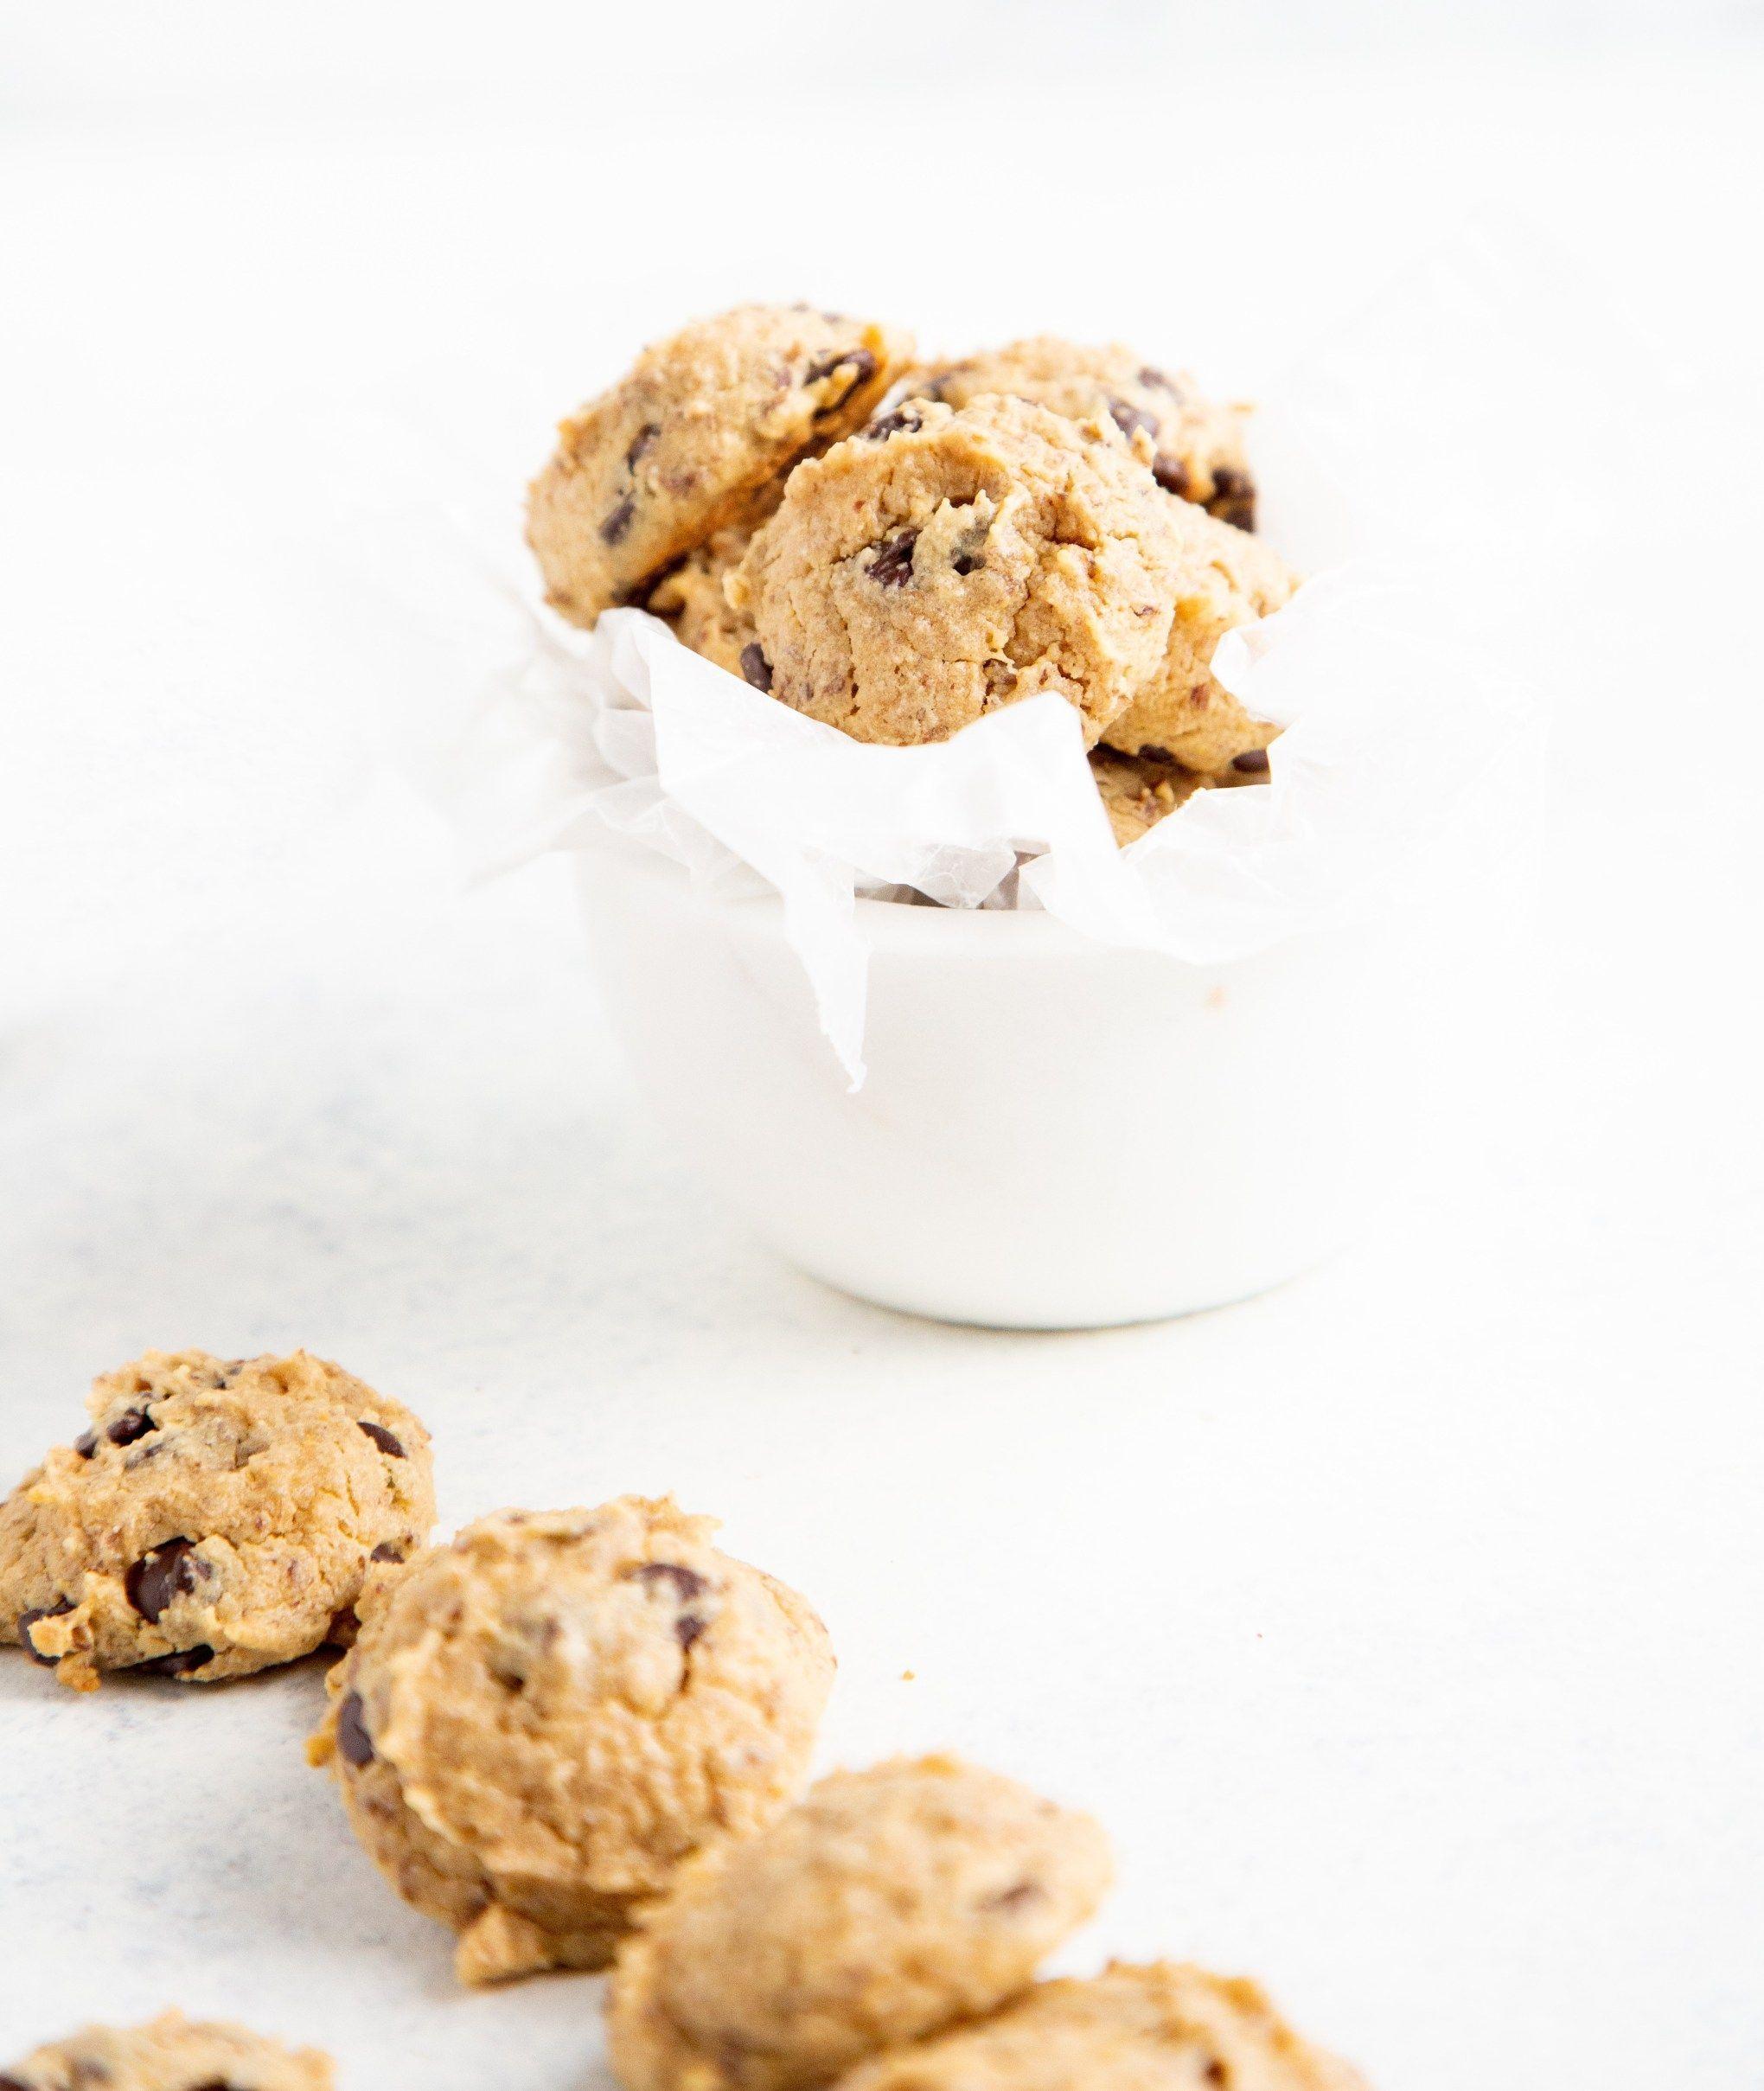 Grain Free Vegan Chocolate Chip Cookies Recipe Grain Free Chocolate Chip Cookies Vegan Chocolate Chip Cookies Chocolate Chip Cookies